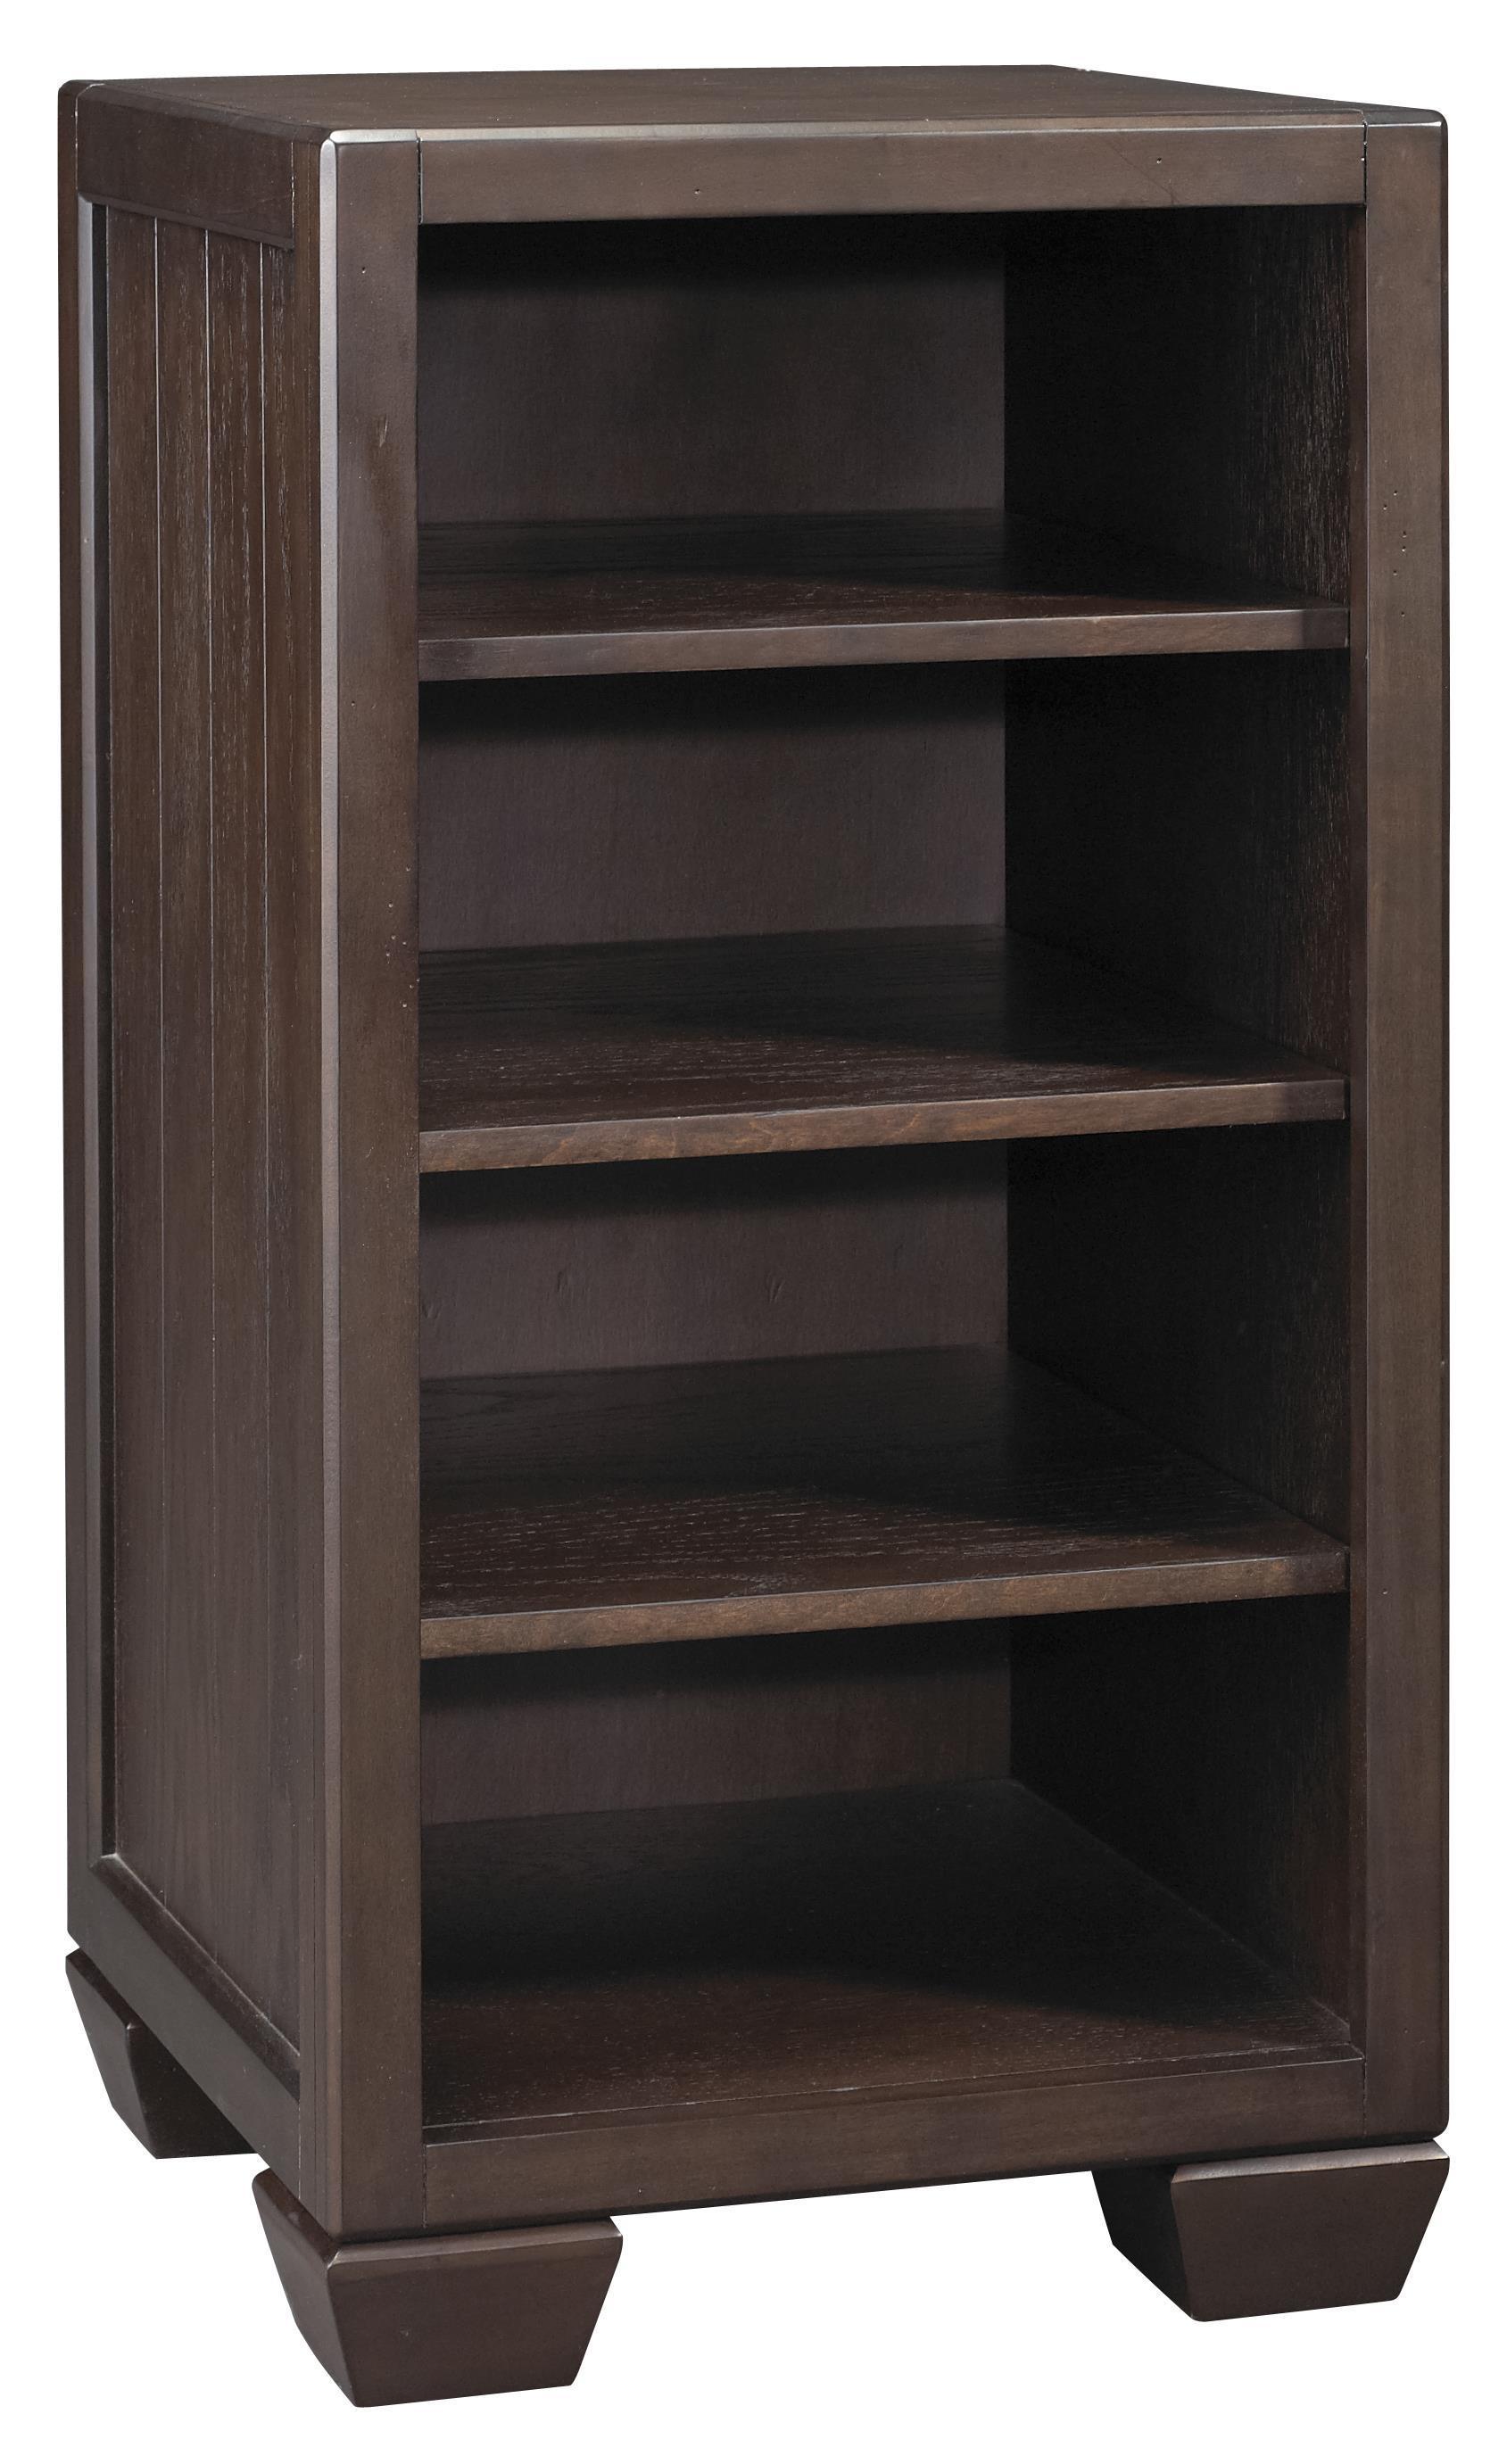 Kidz Gear Mason Bookcase - Item Number: 8872-426